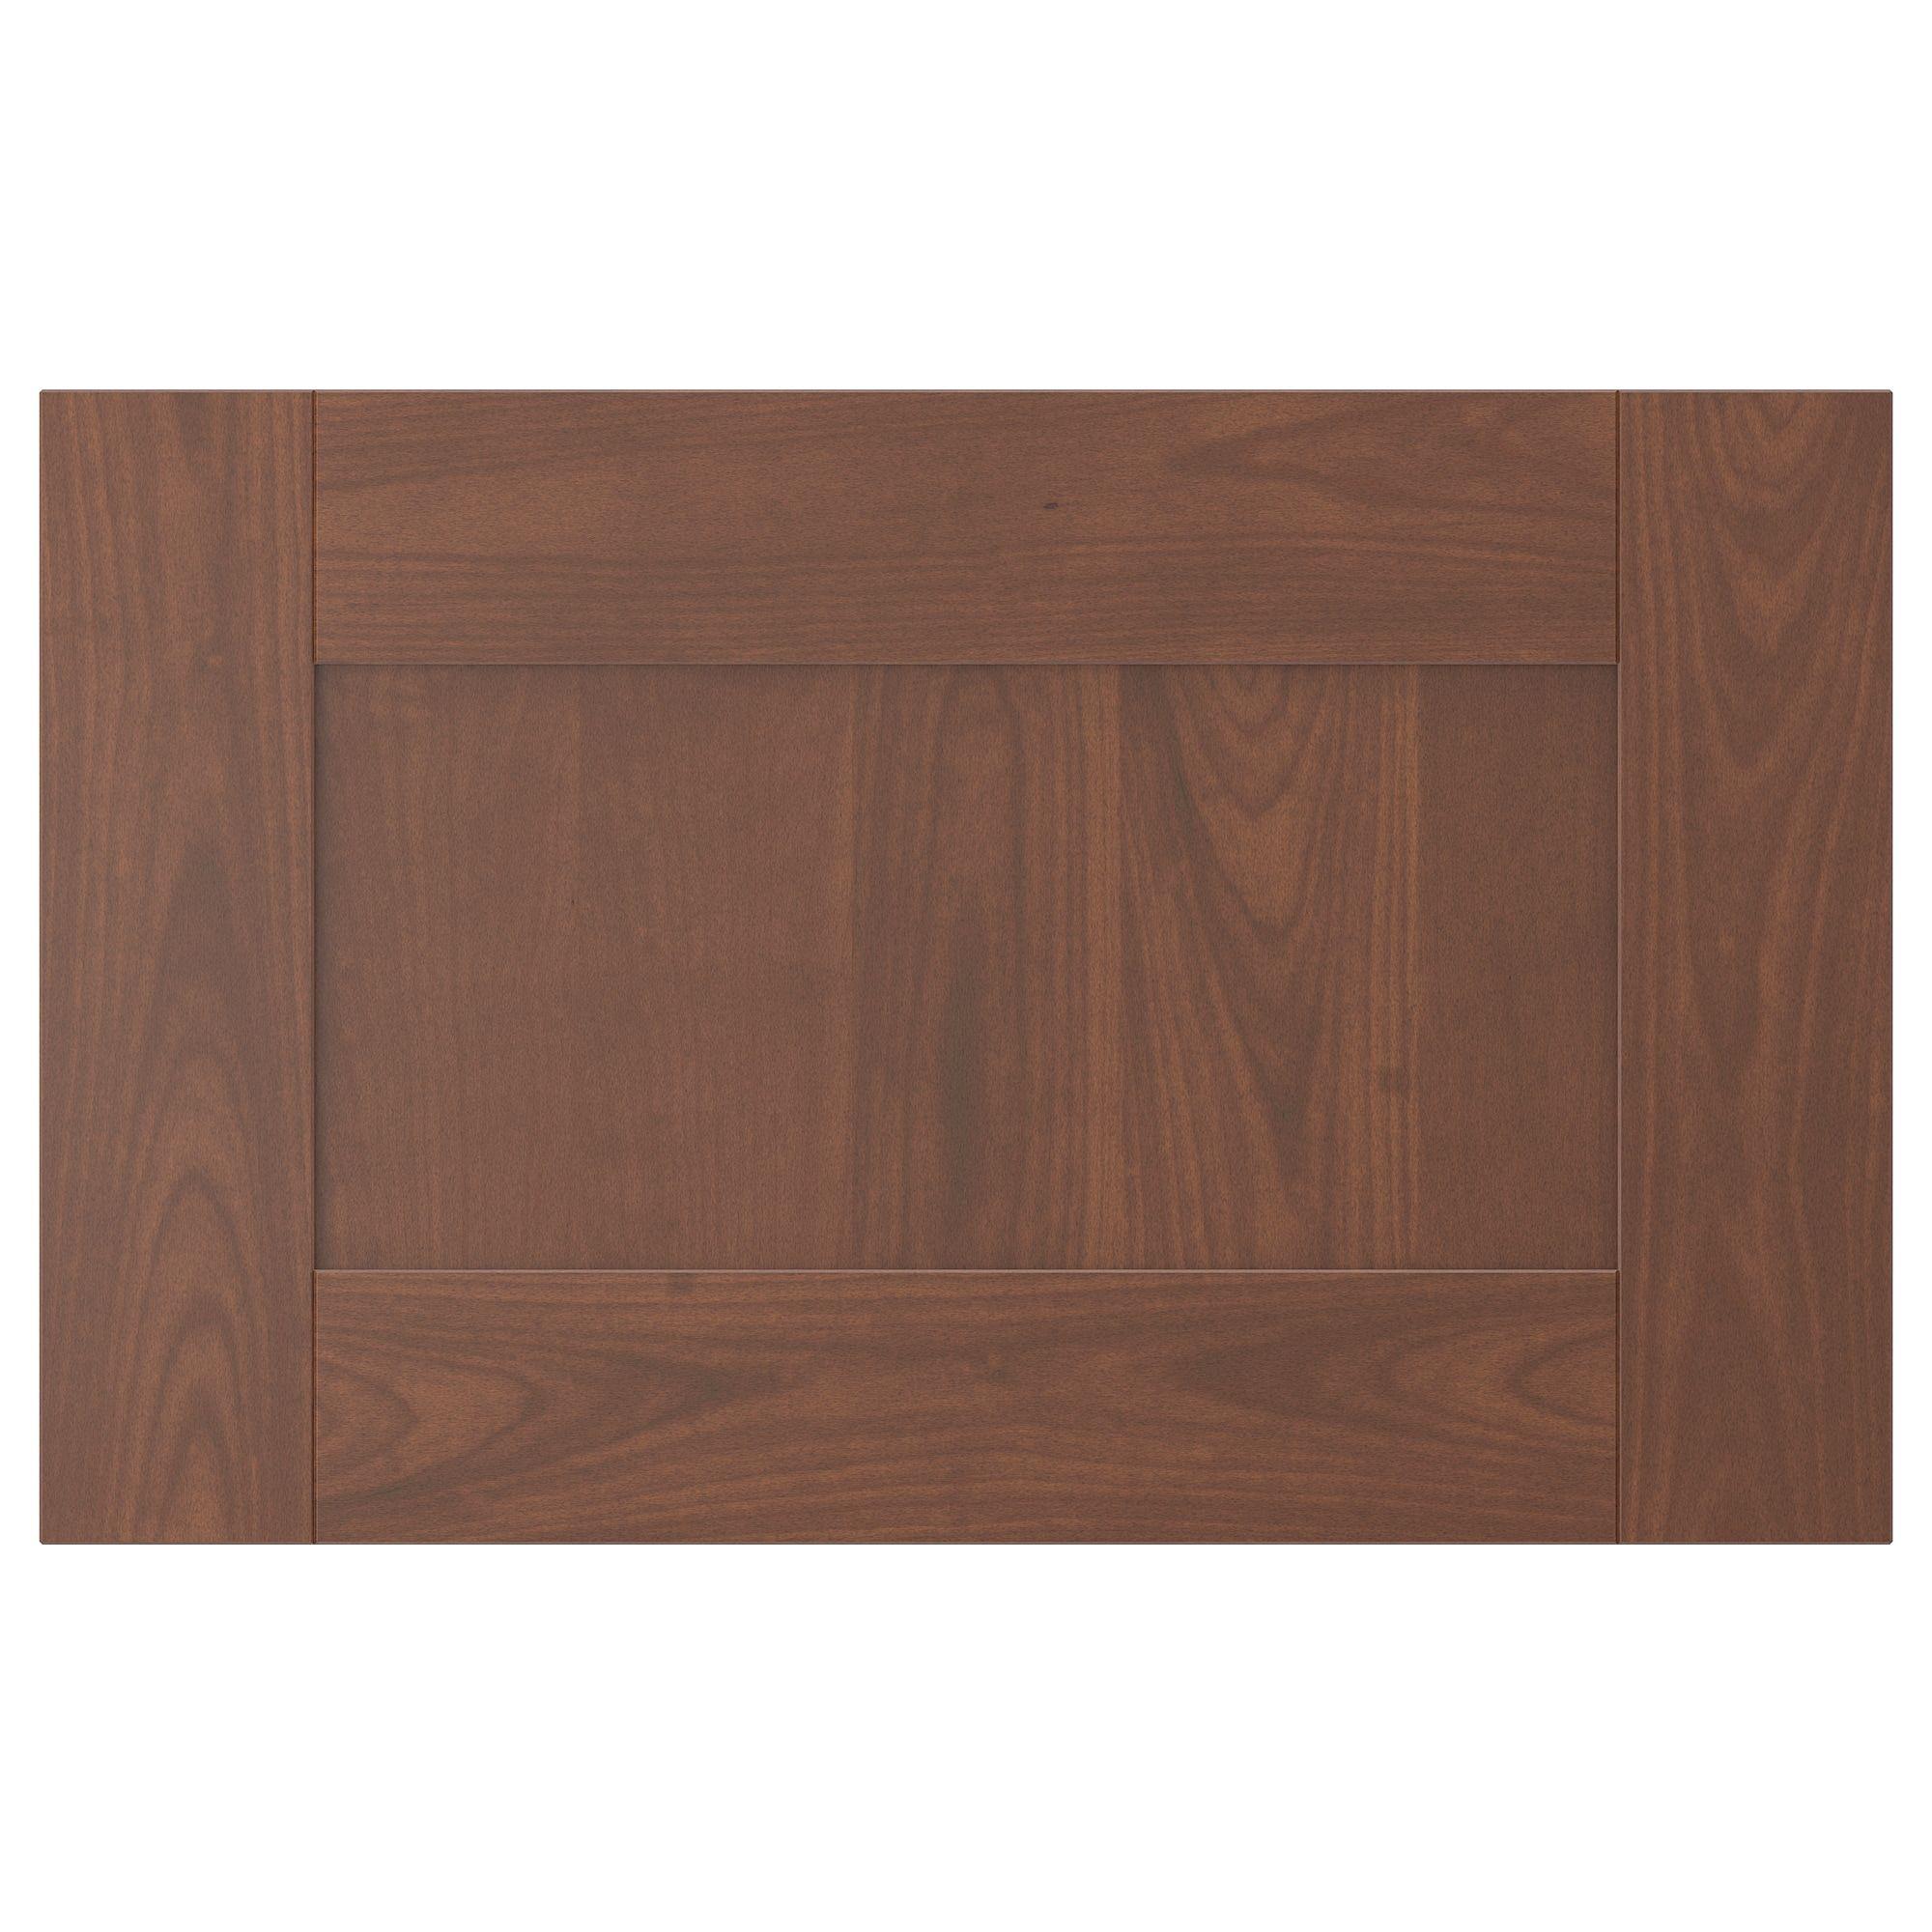 Best Ikea Grimslov Brown Drawer Front Brown Drawers Brown 640 x 480